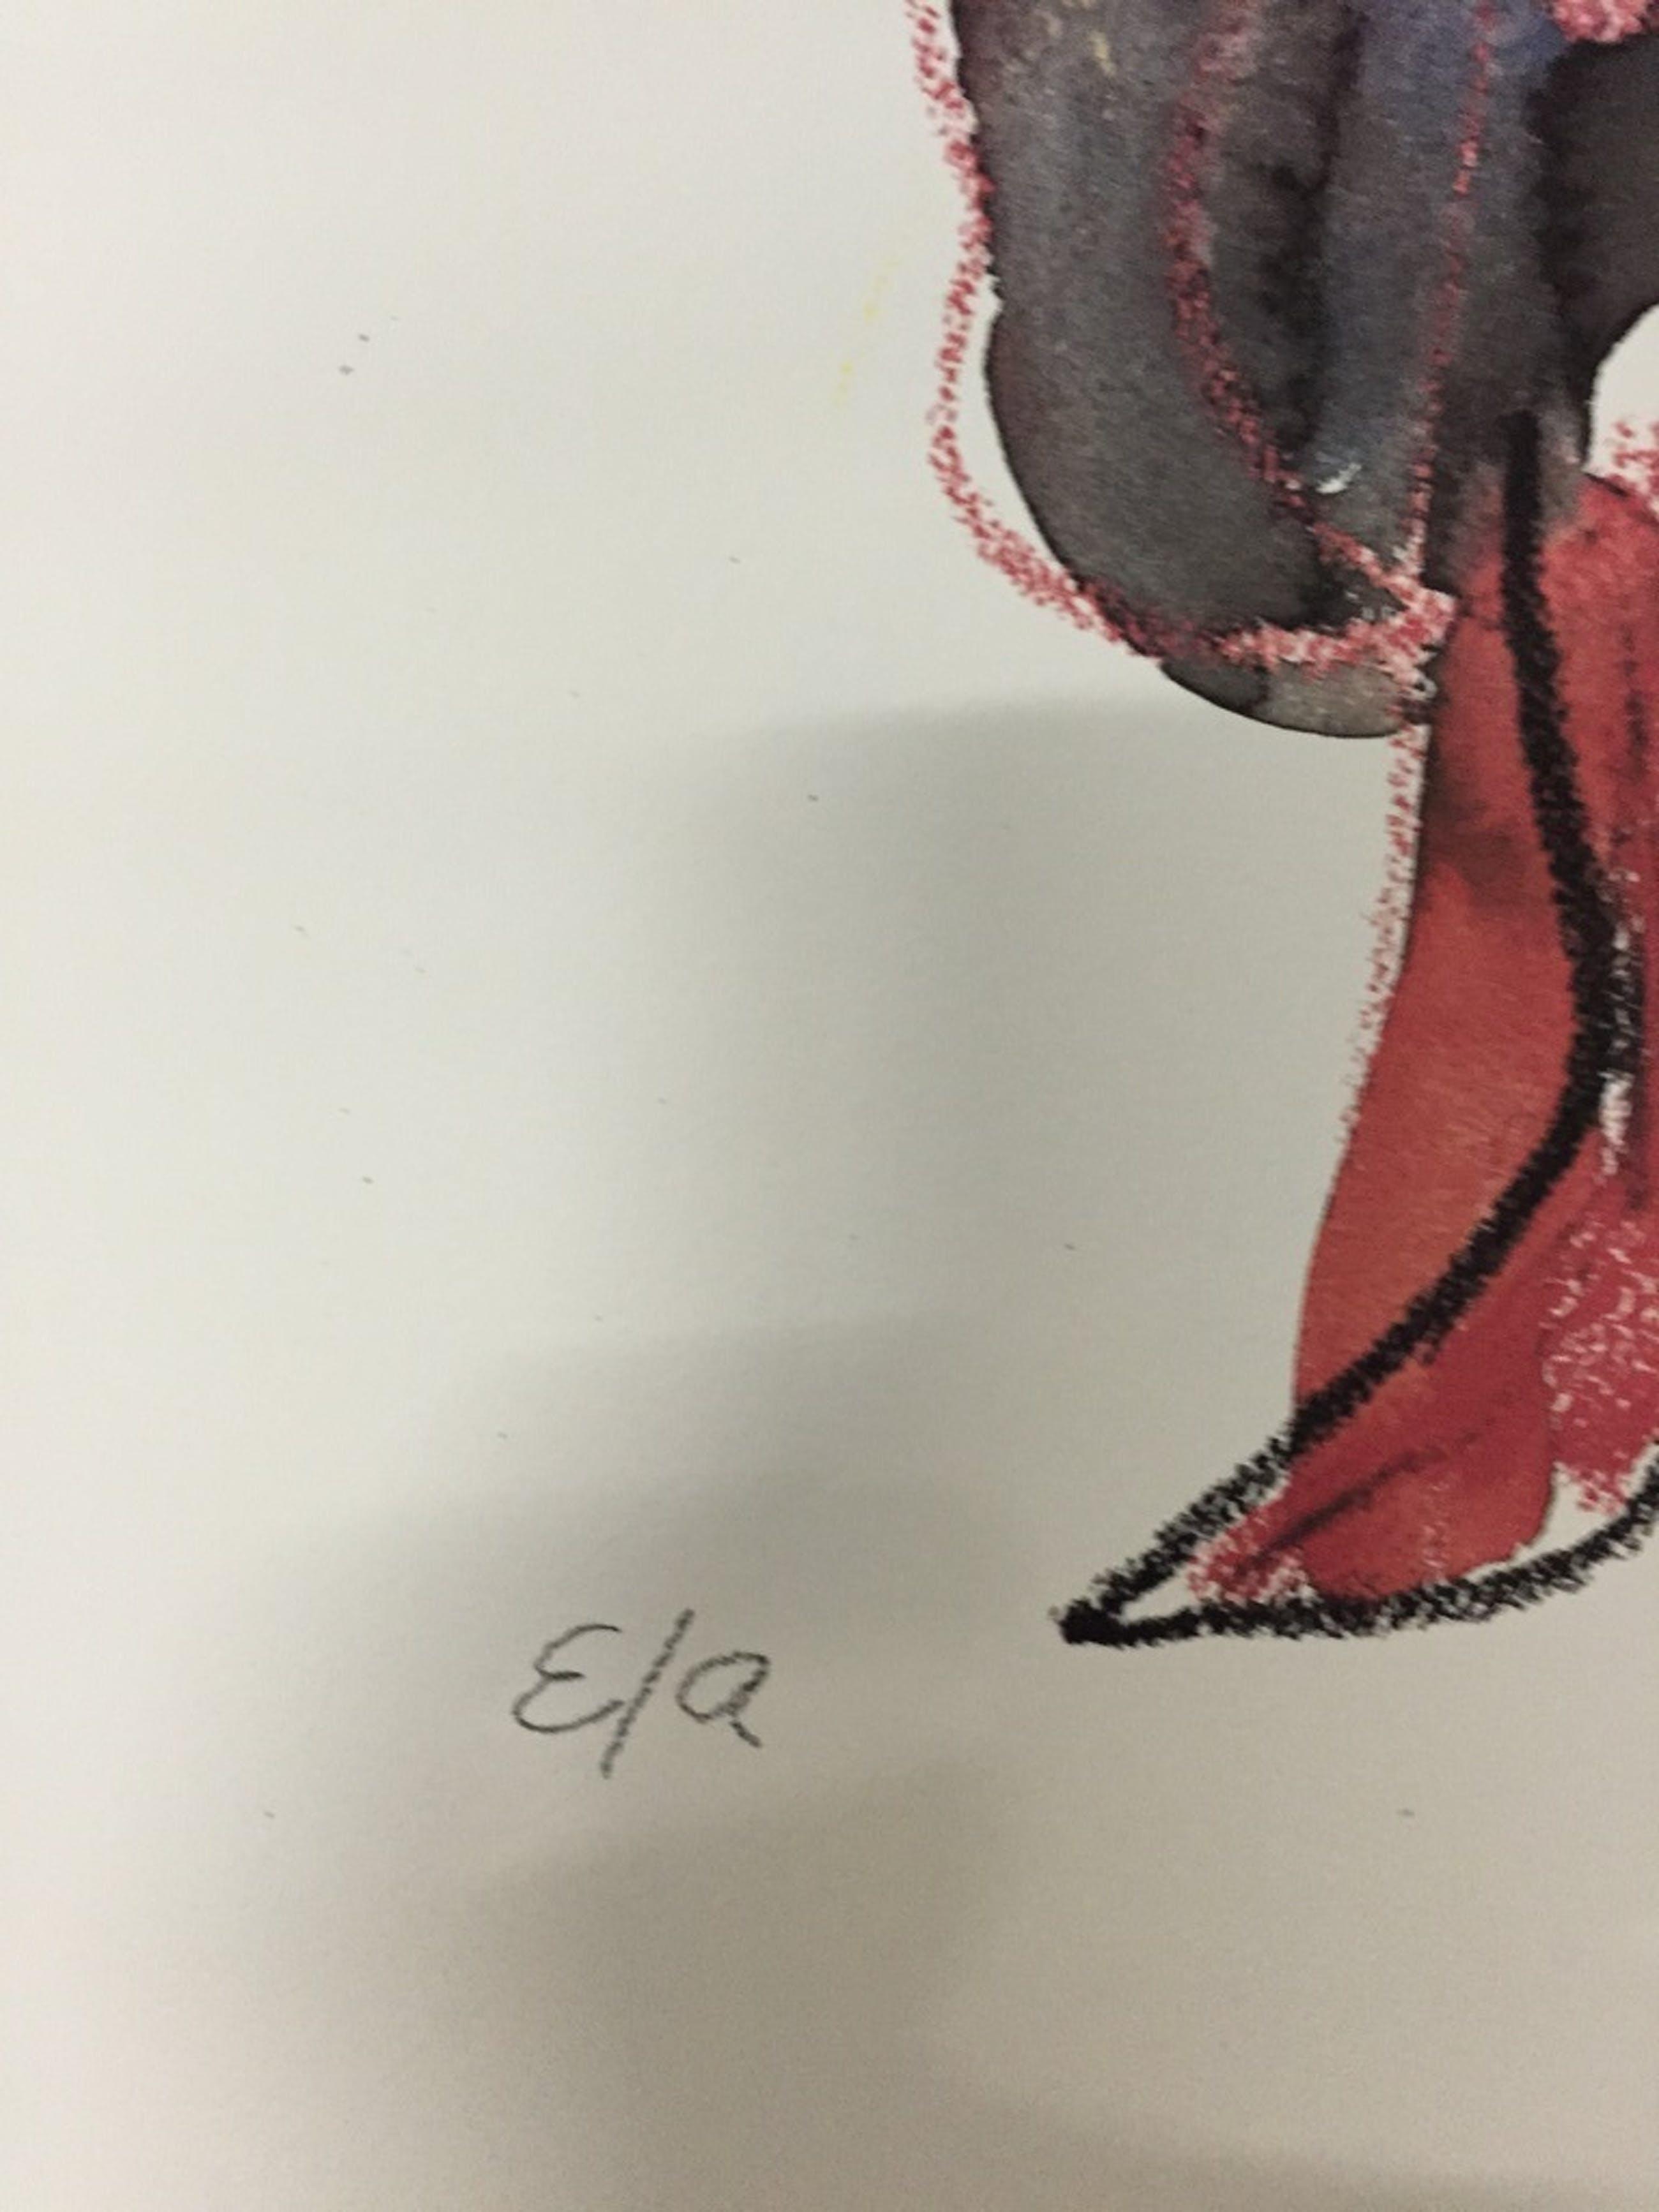 JAN SIERHUIS  Originele EA piezo/zeefdruk   Titel: Flamenco  2006 kopen? Bied vanaf 1!